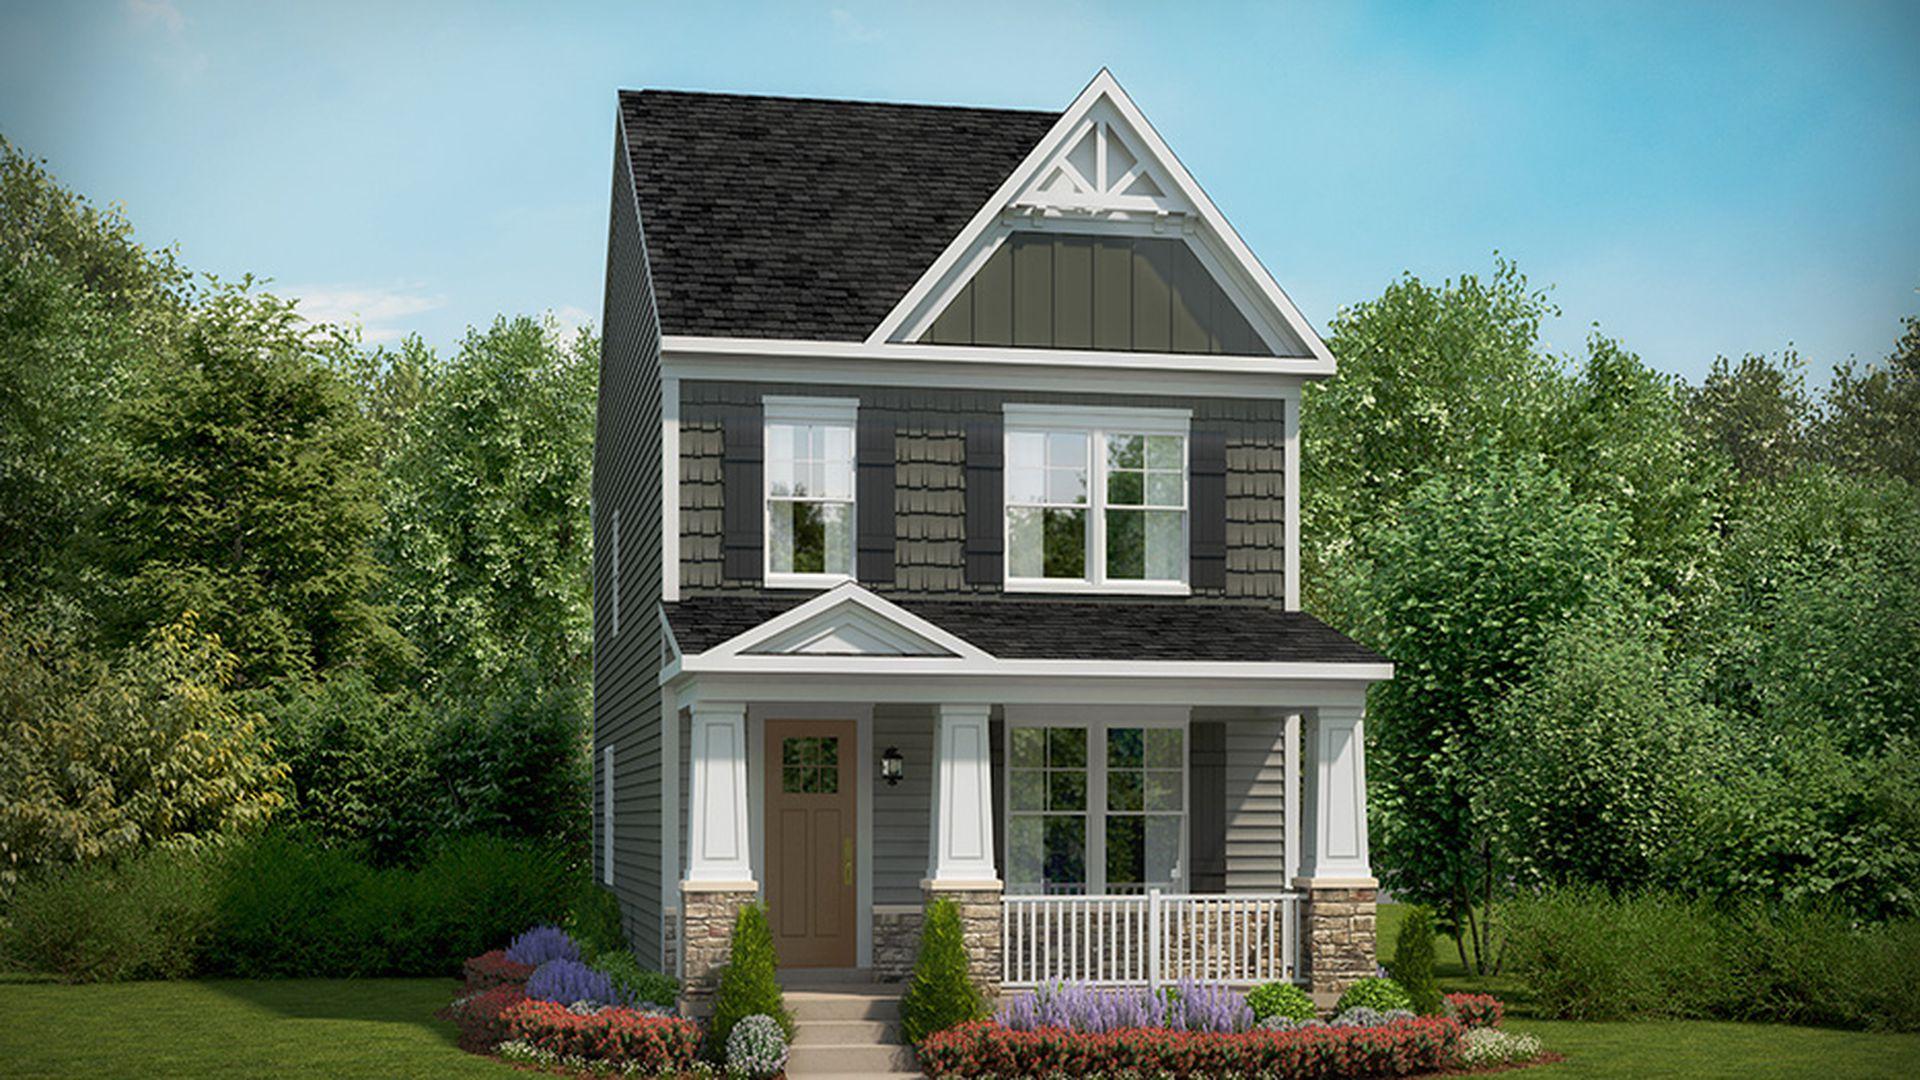 Super Charlottesville Real Estate Charlottesville Va Homes For Home Interior And Landscaping Ologienasavecom